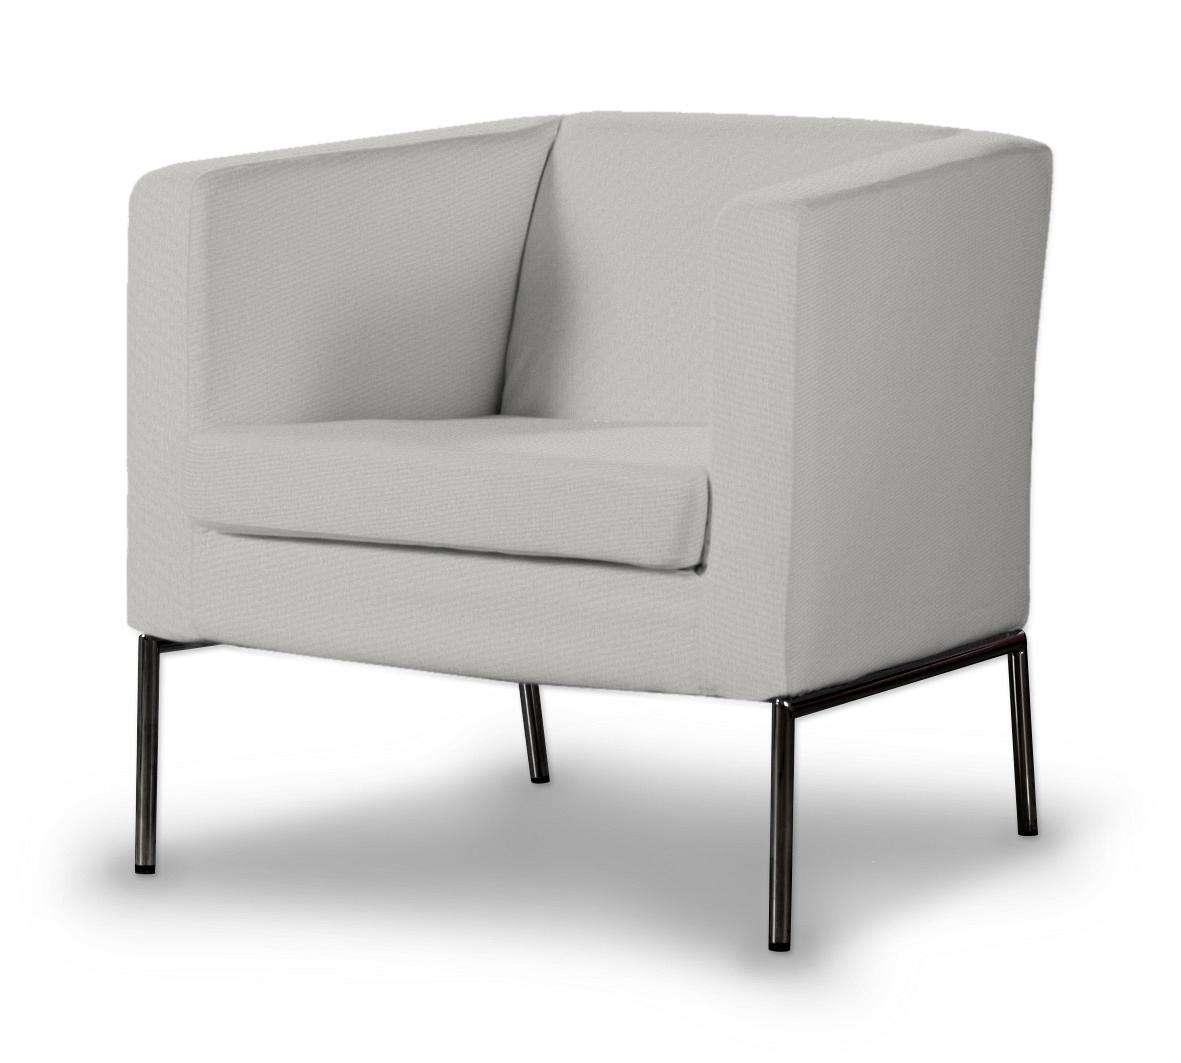 Klappsta Sesselbezug Sessel Klappsta von der Kollektion Etna, Stoff: 705-90